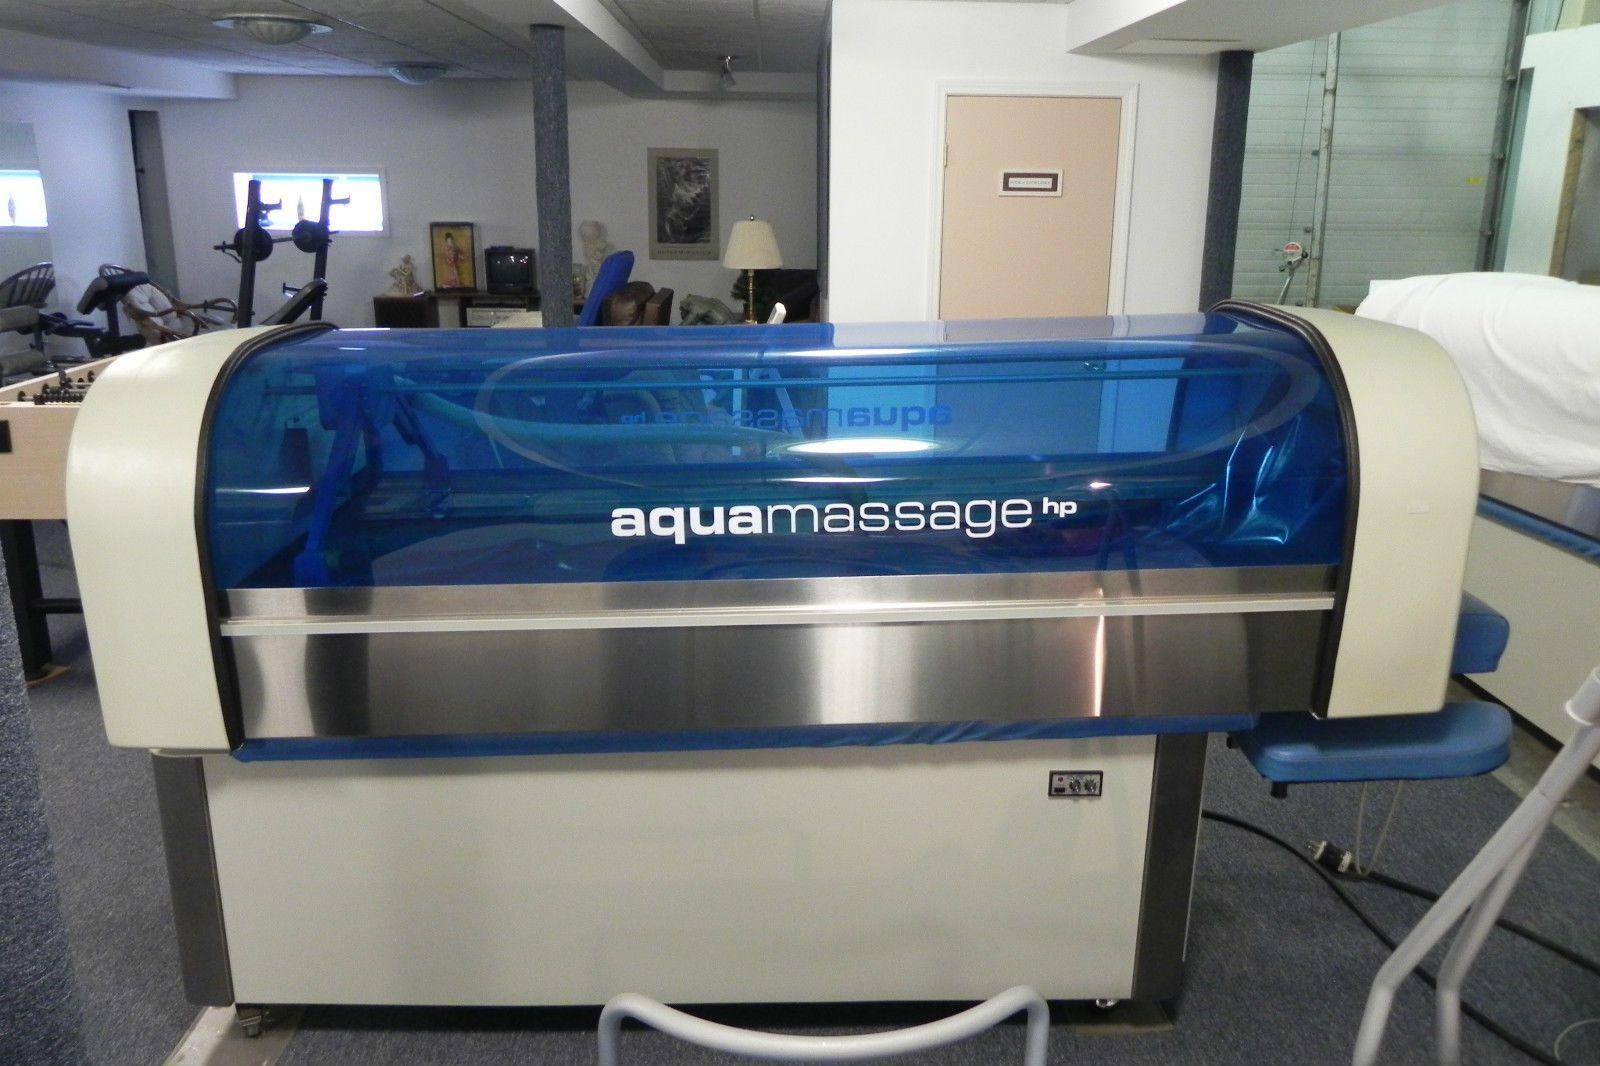 Aqua Massage Full Body Water Massage | eBay | N E I G H B O R S ...